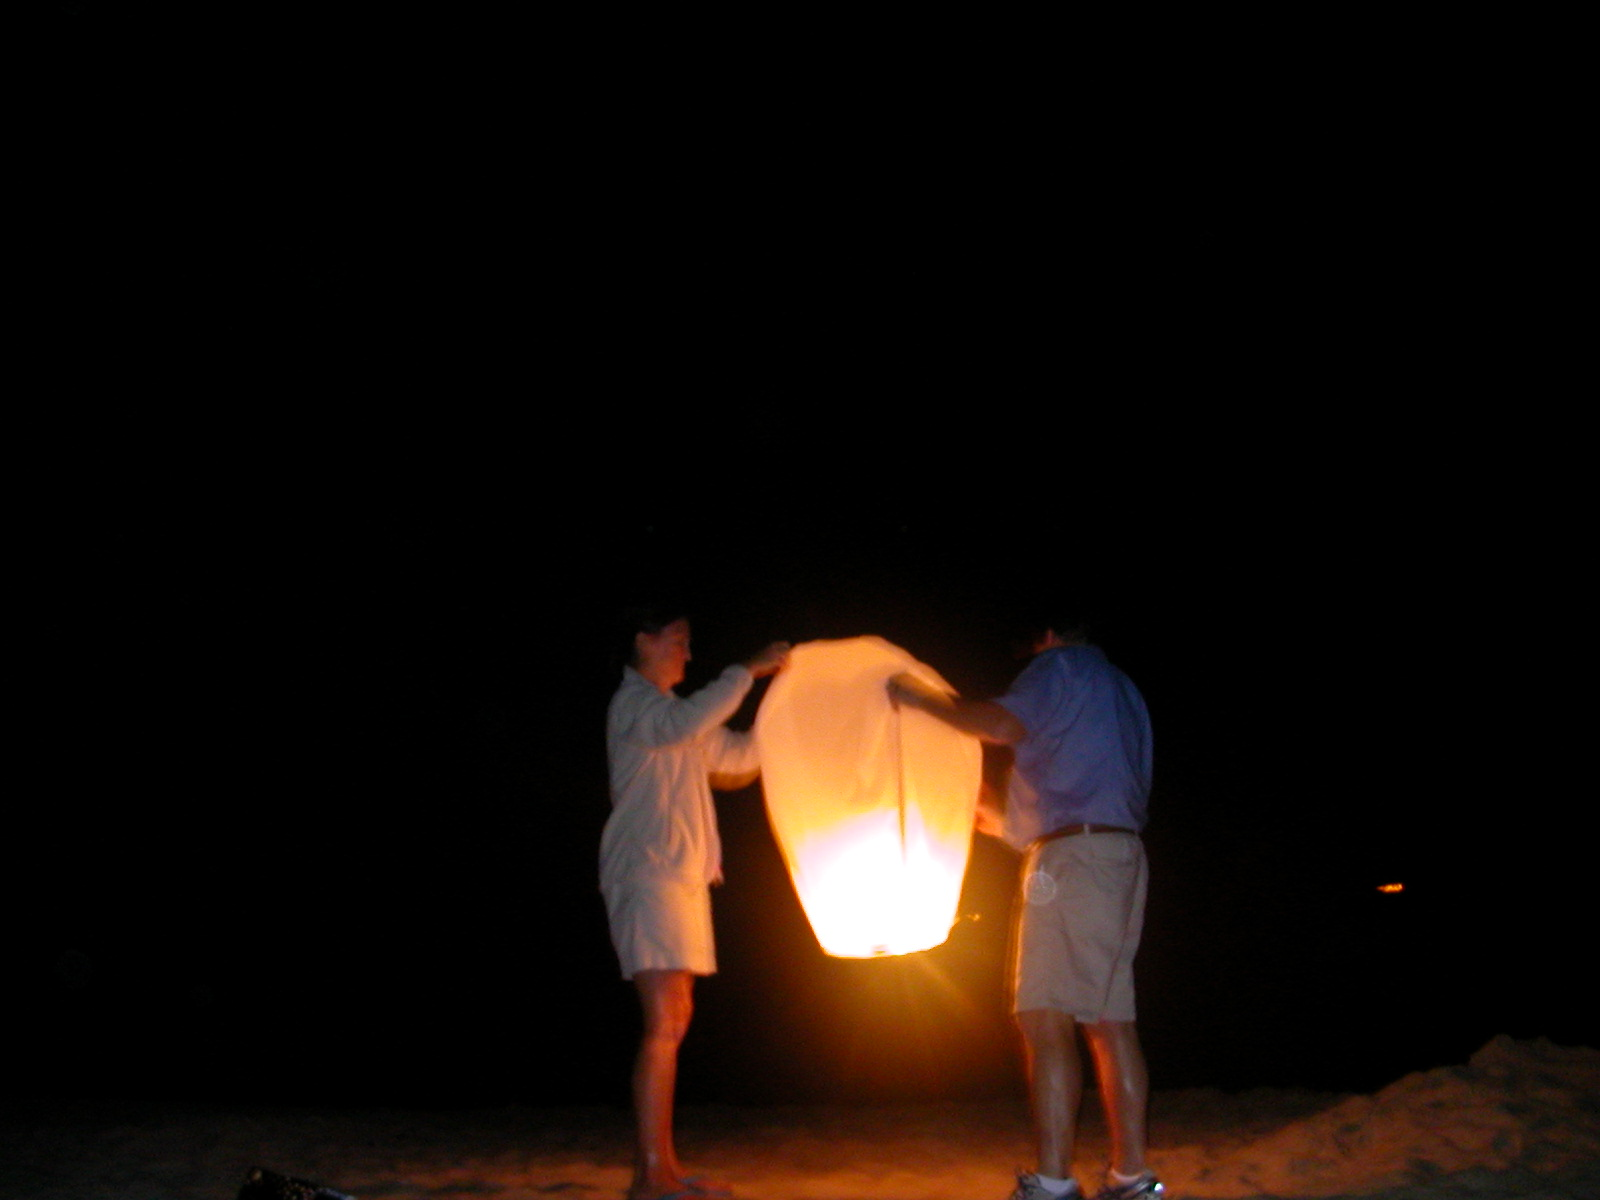 Sky Lanterns at night, on the beach – The Sandcastle Lady for lanterns at night beach  150ifm